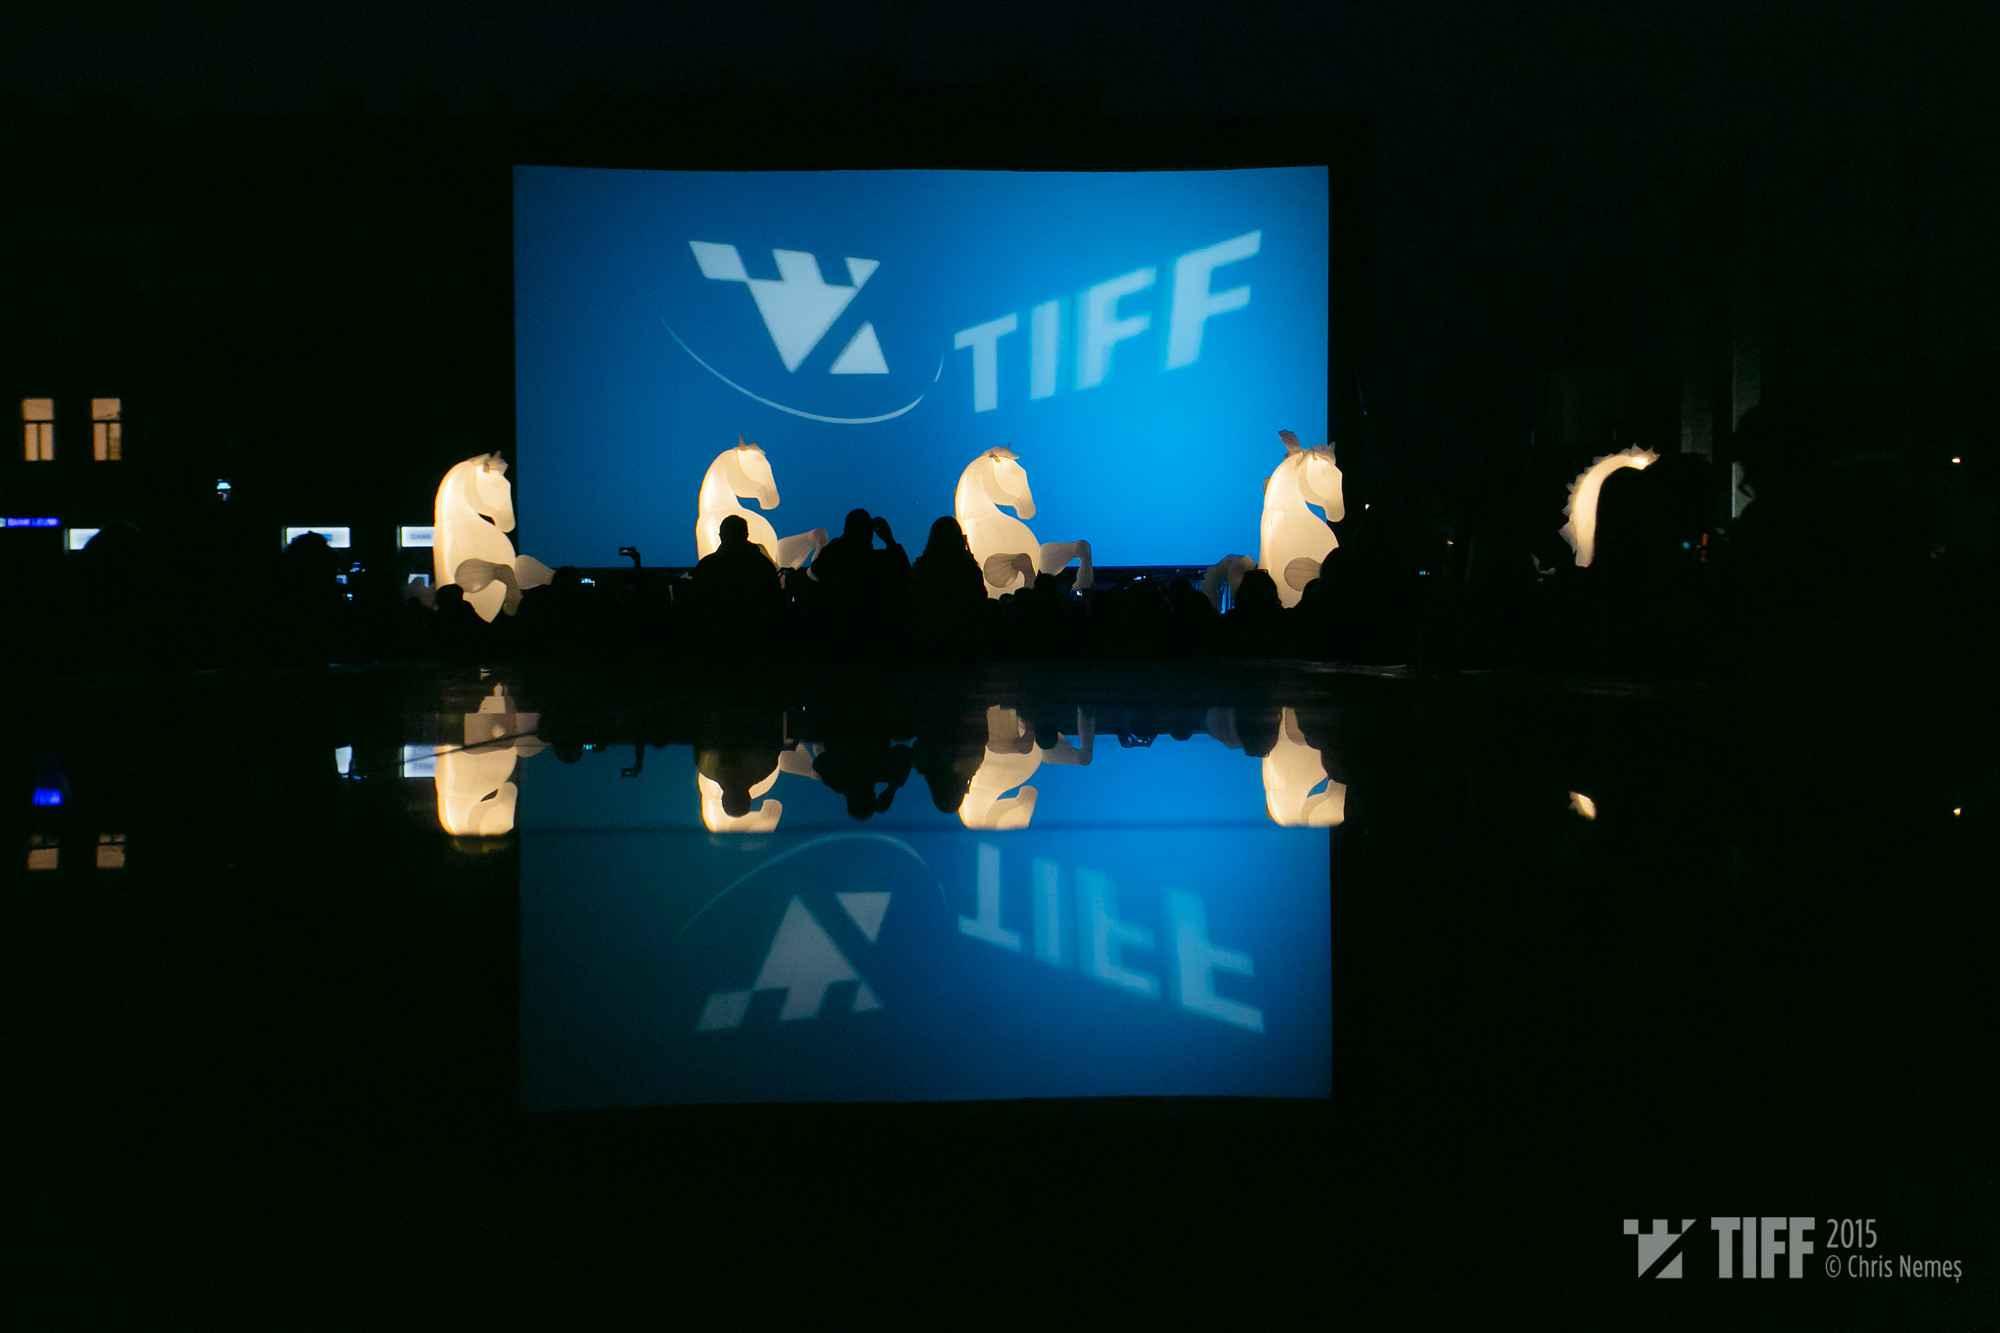 Compagnie des Quidams - Deschiderea TIFF 2015 Foto Chris Nemes 2